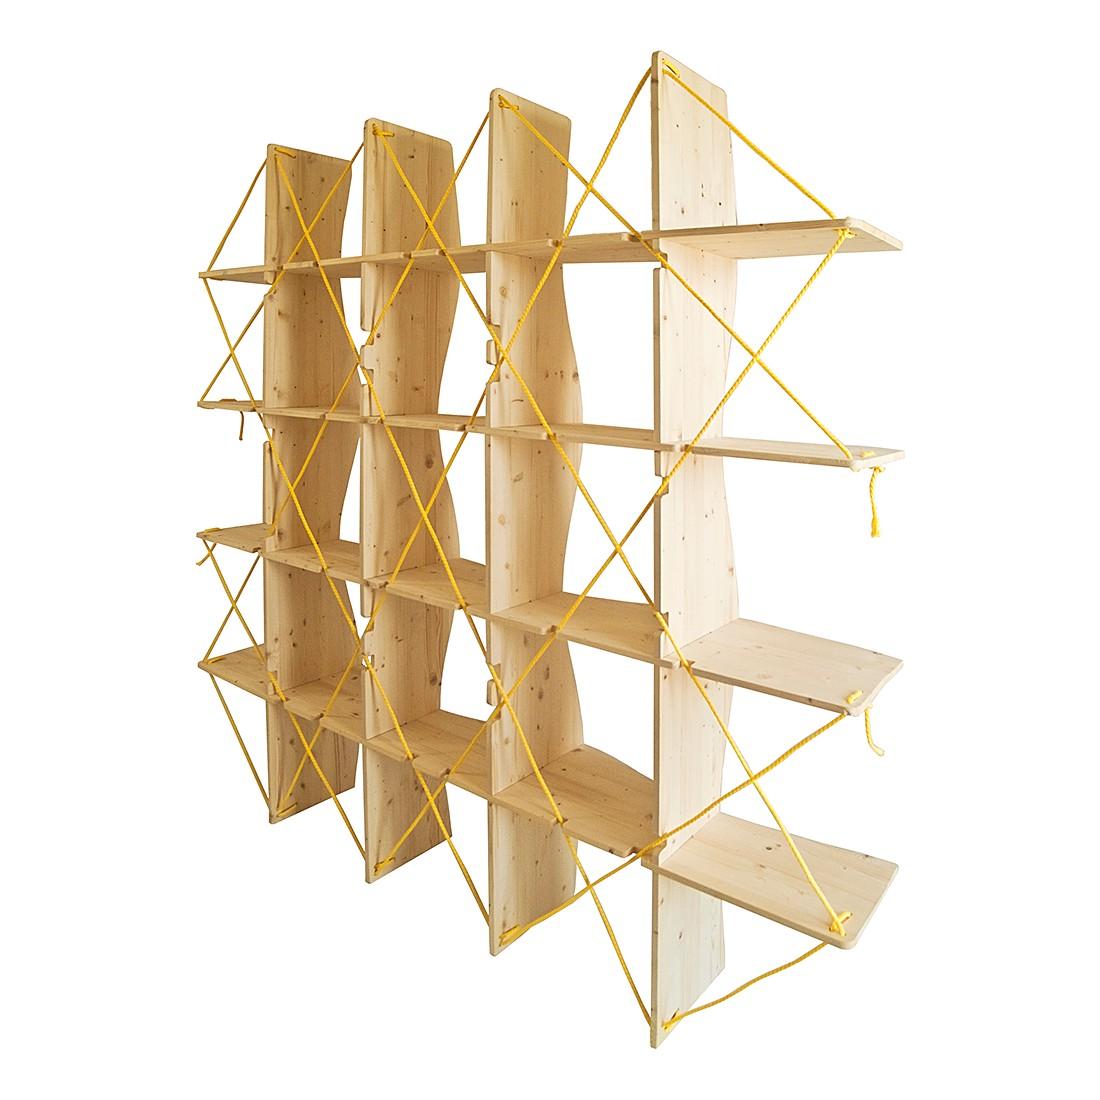 Bücherregal Sail – Pinie Dekor/Gelb, Metrocuadro Design bestellen